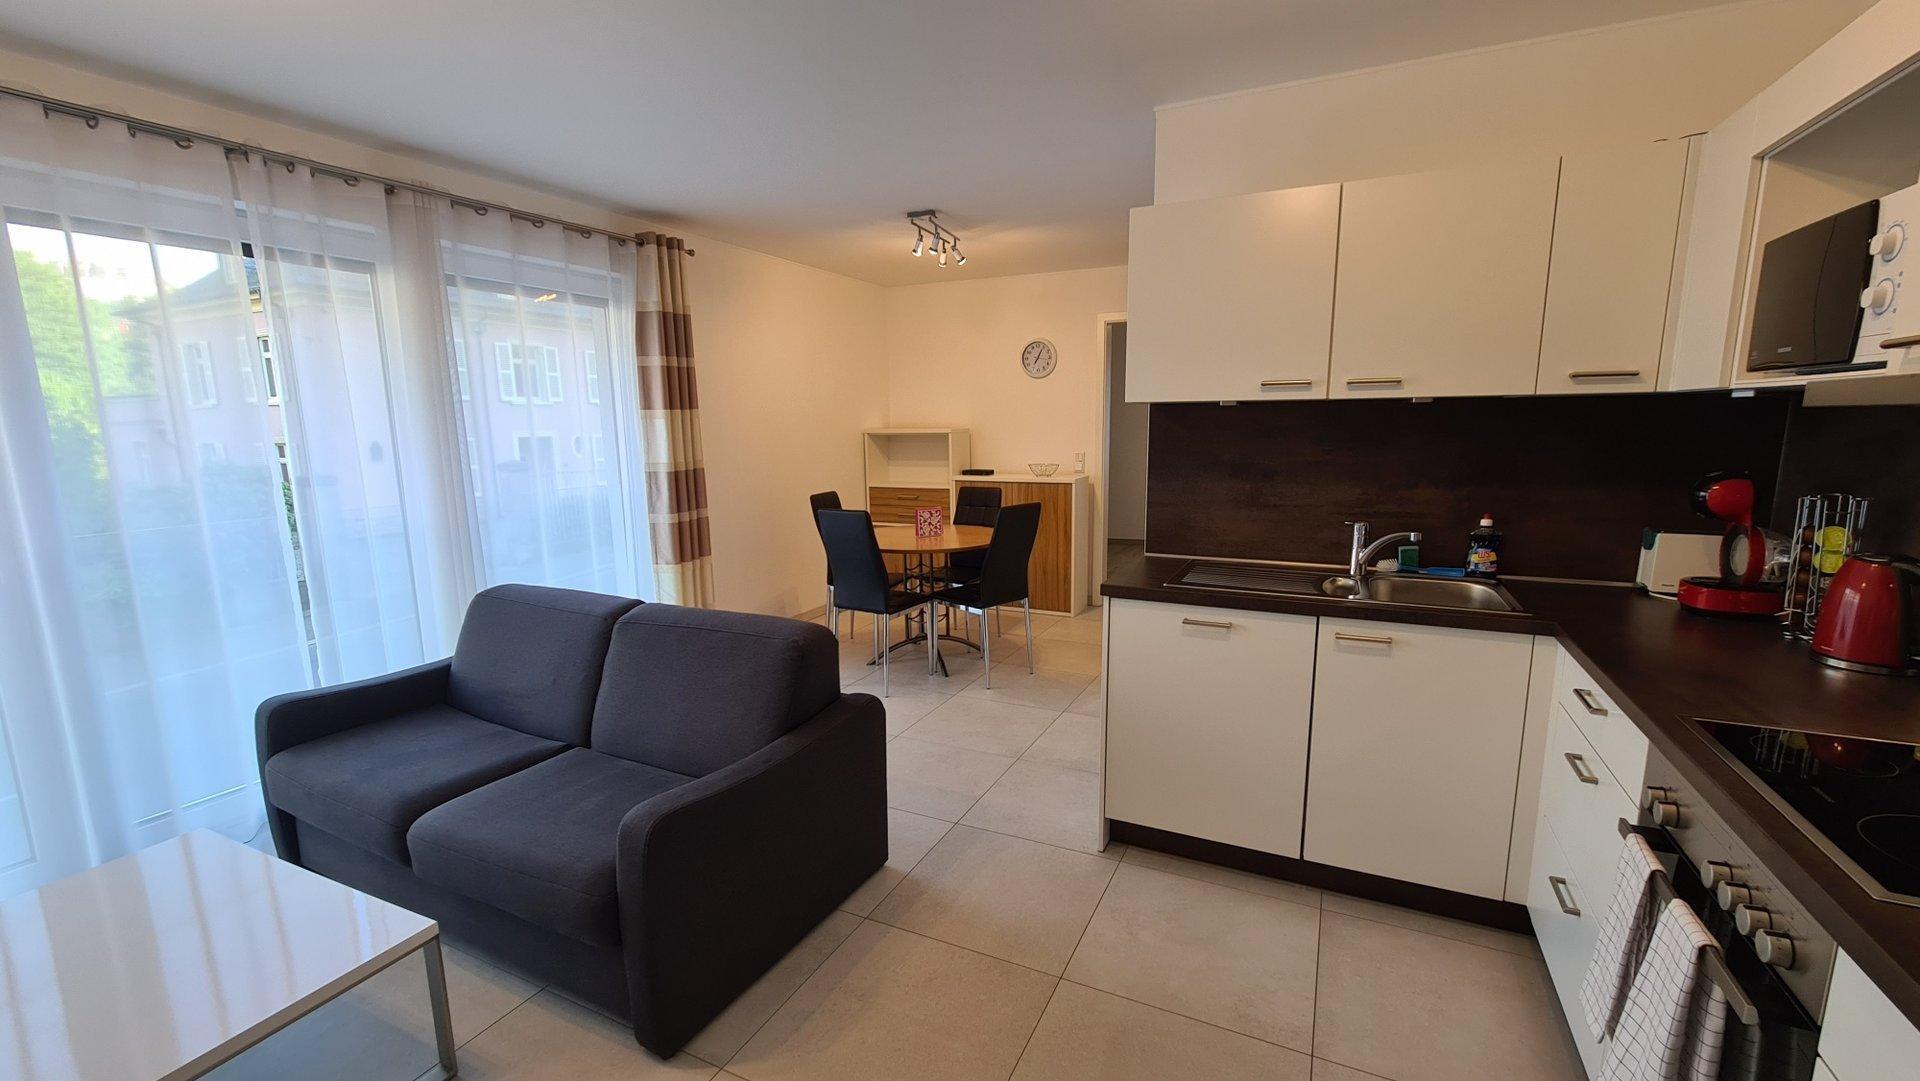 Belle appartement meublé 1 chambre à Luxembourg-Beggen